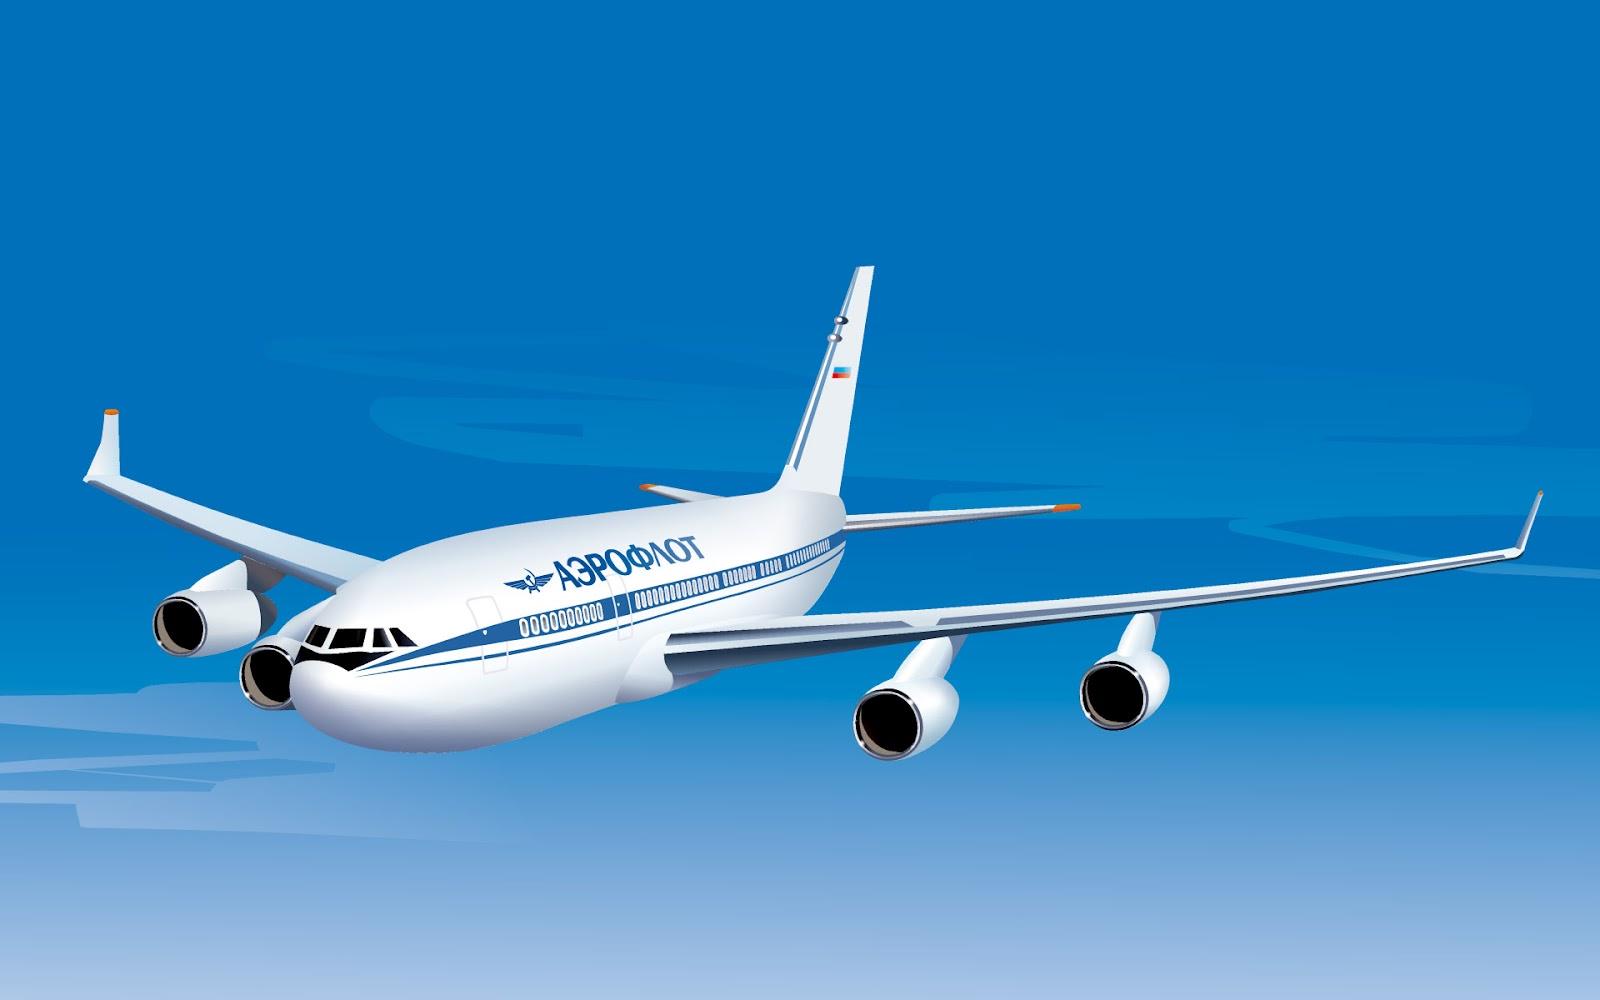 WALLPAPERS: aeroplane wallpapers | airplane wallpapers ...